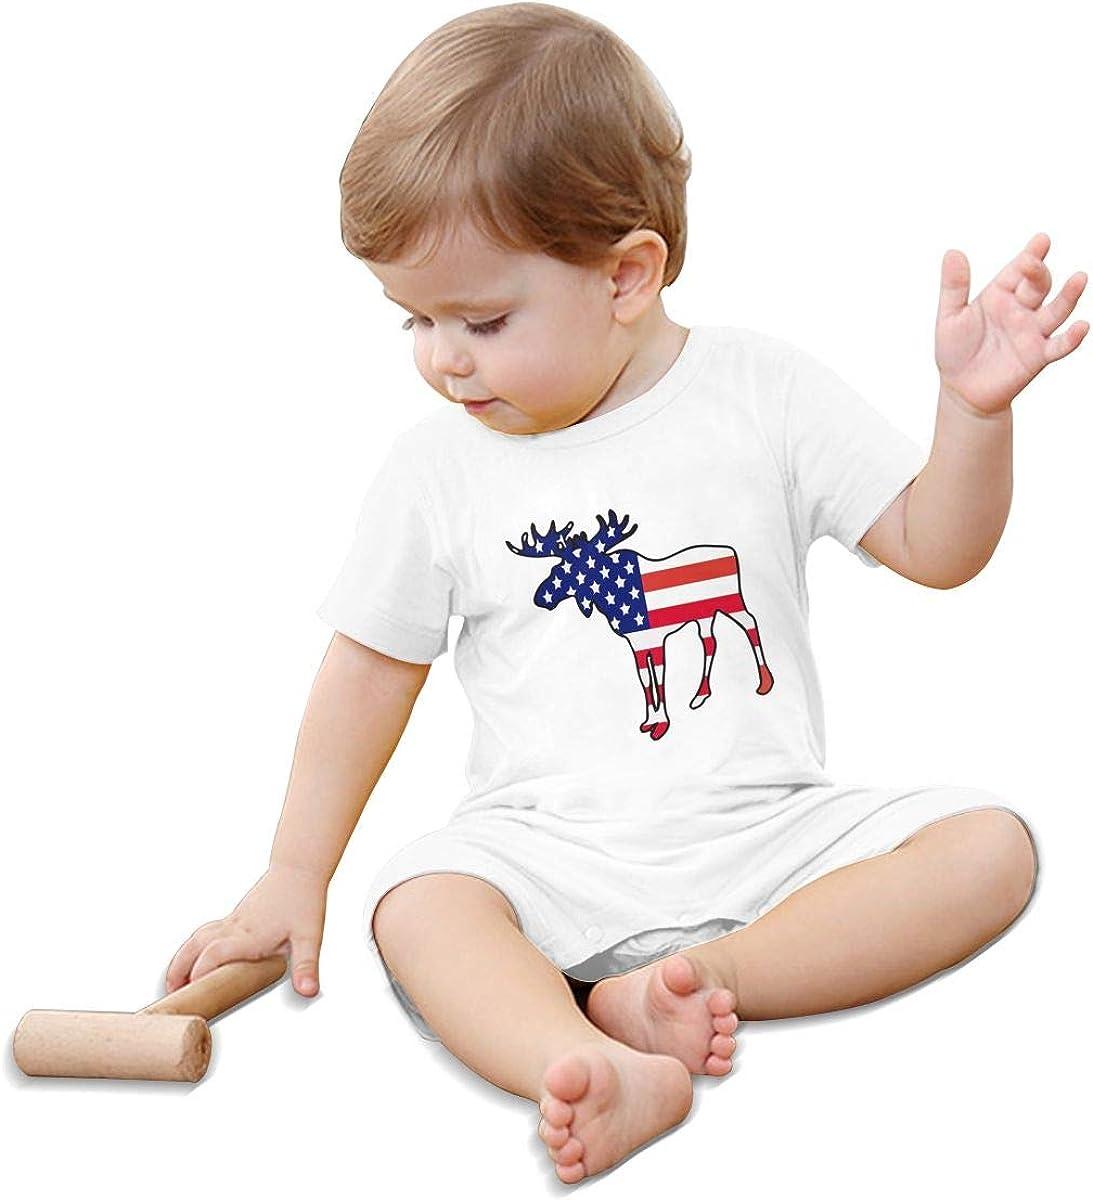 Mri-le1 Baby Boy Girl Jumpsuit American Flag Moose Toddler Jumpsuit